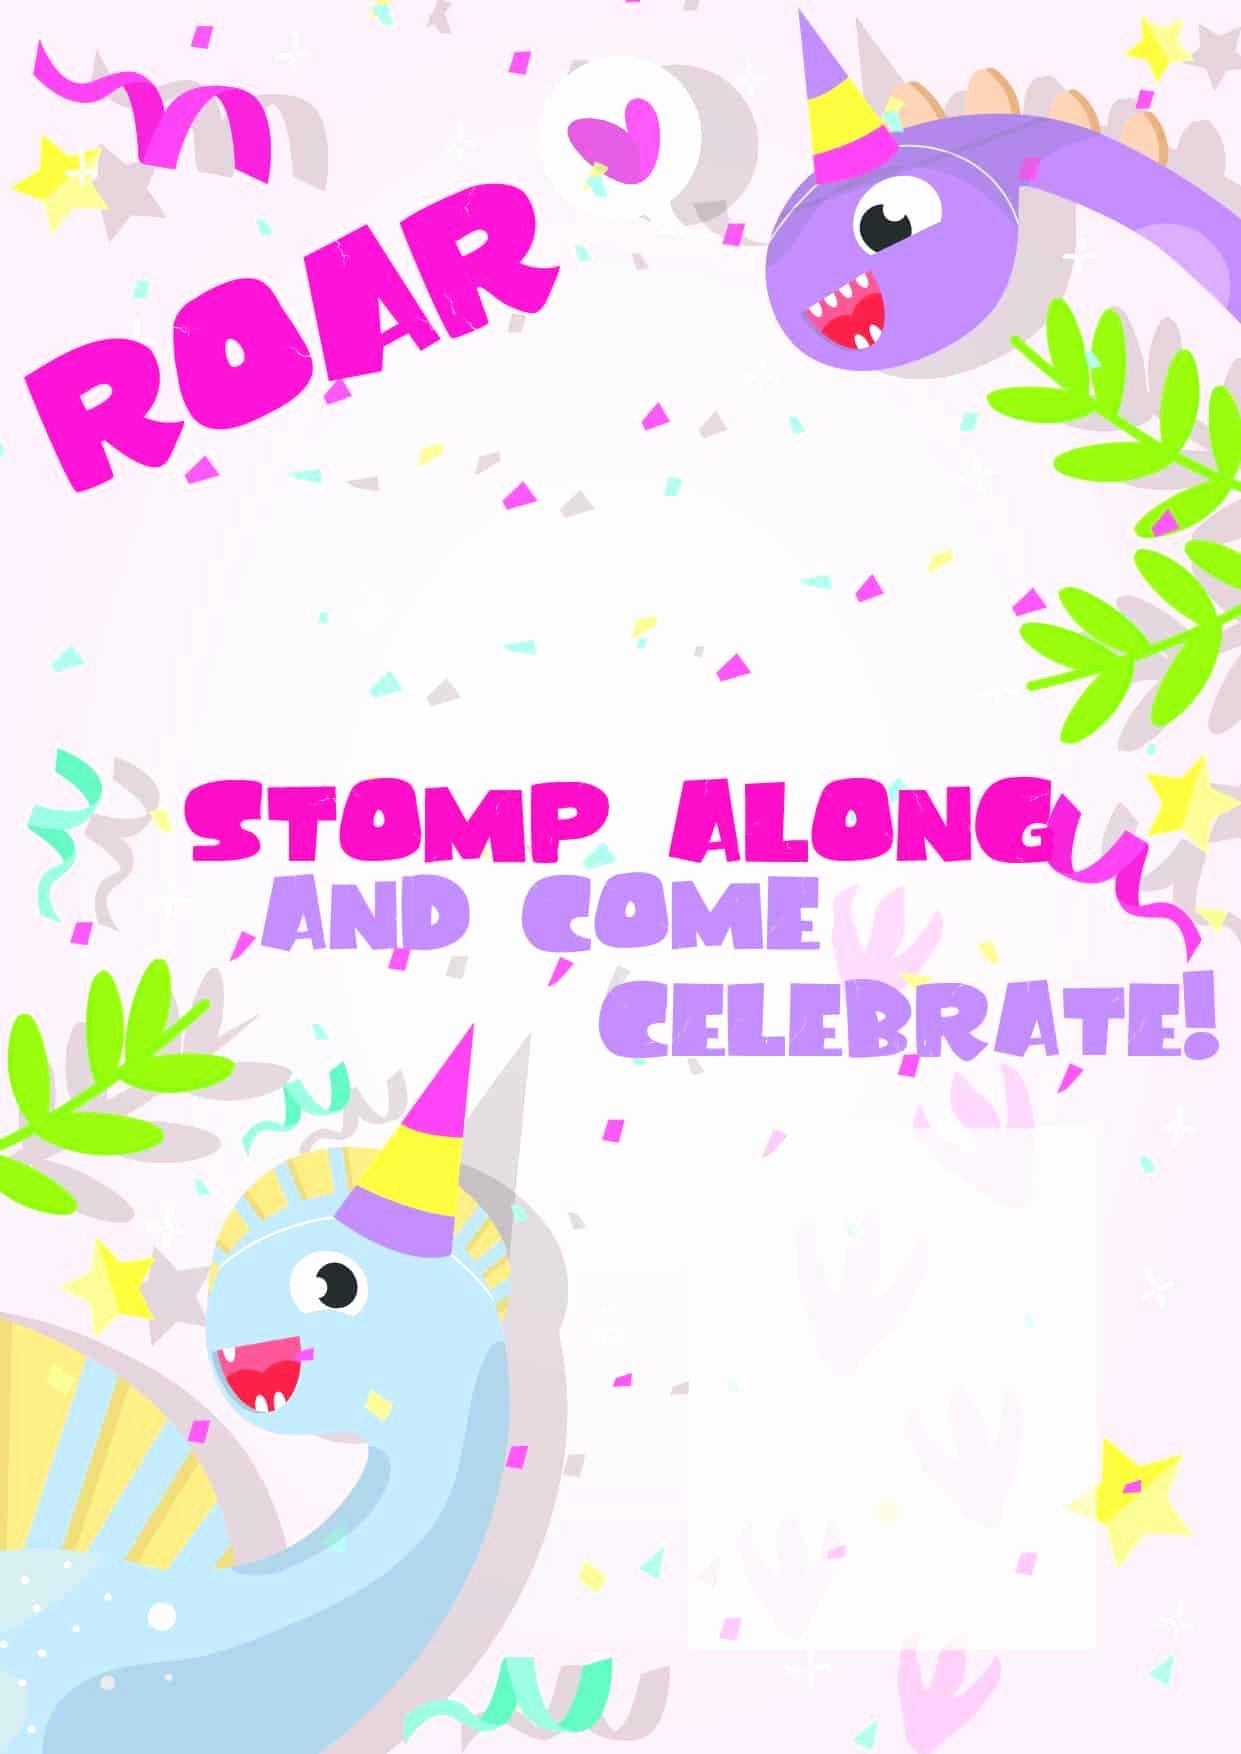 Free Printable Dinosaur Birthday Invitations Best Of Dinosaur Birthday Invitations Free Printable Party with Unicorns